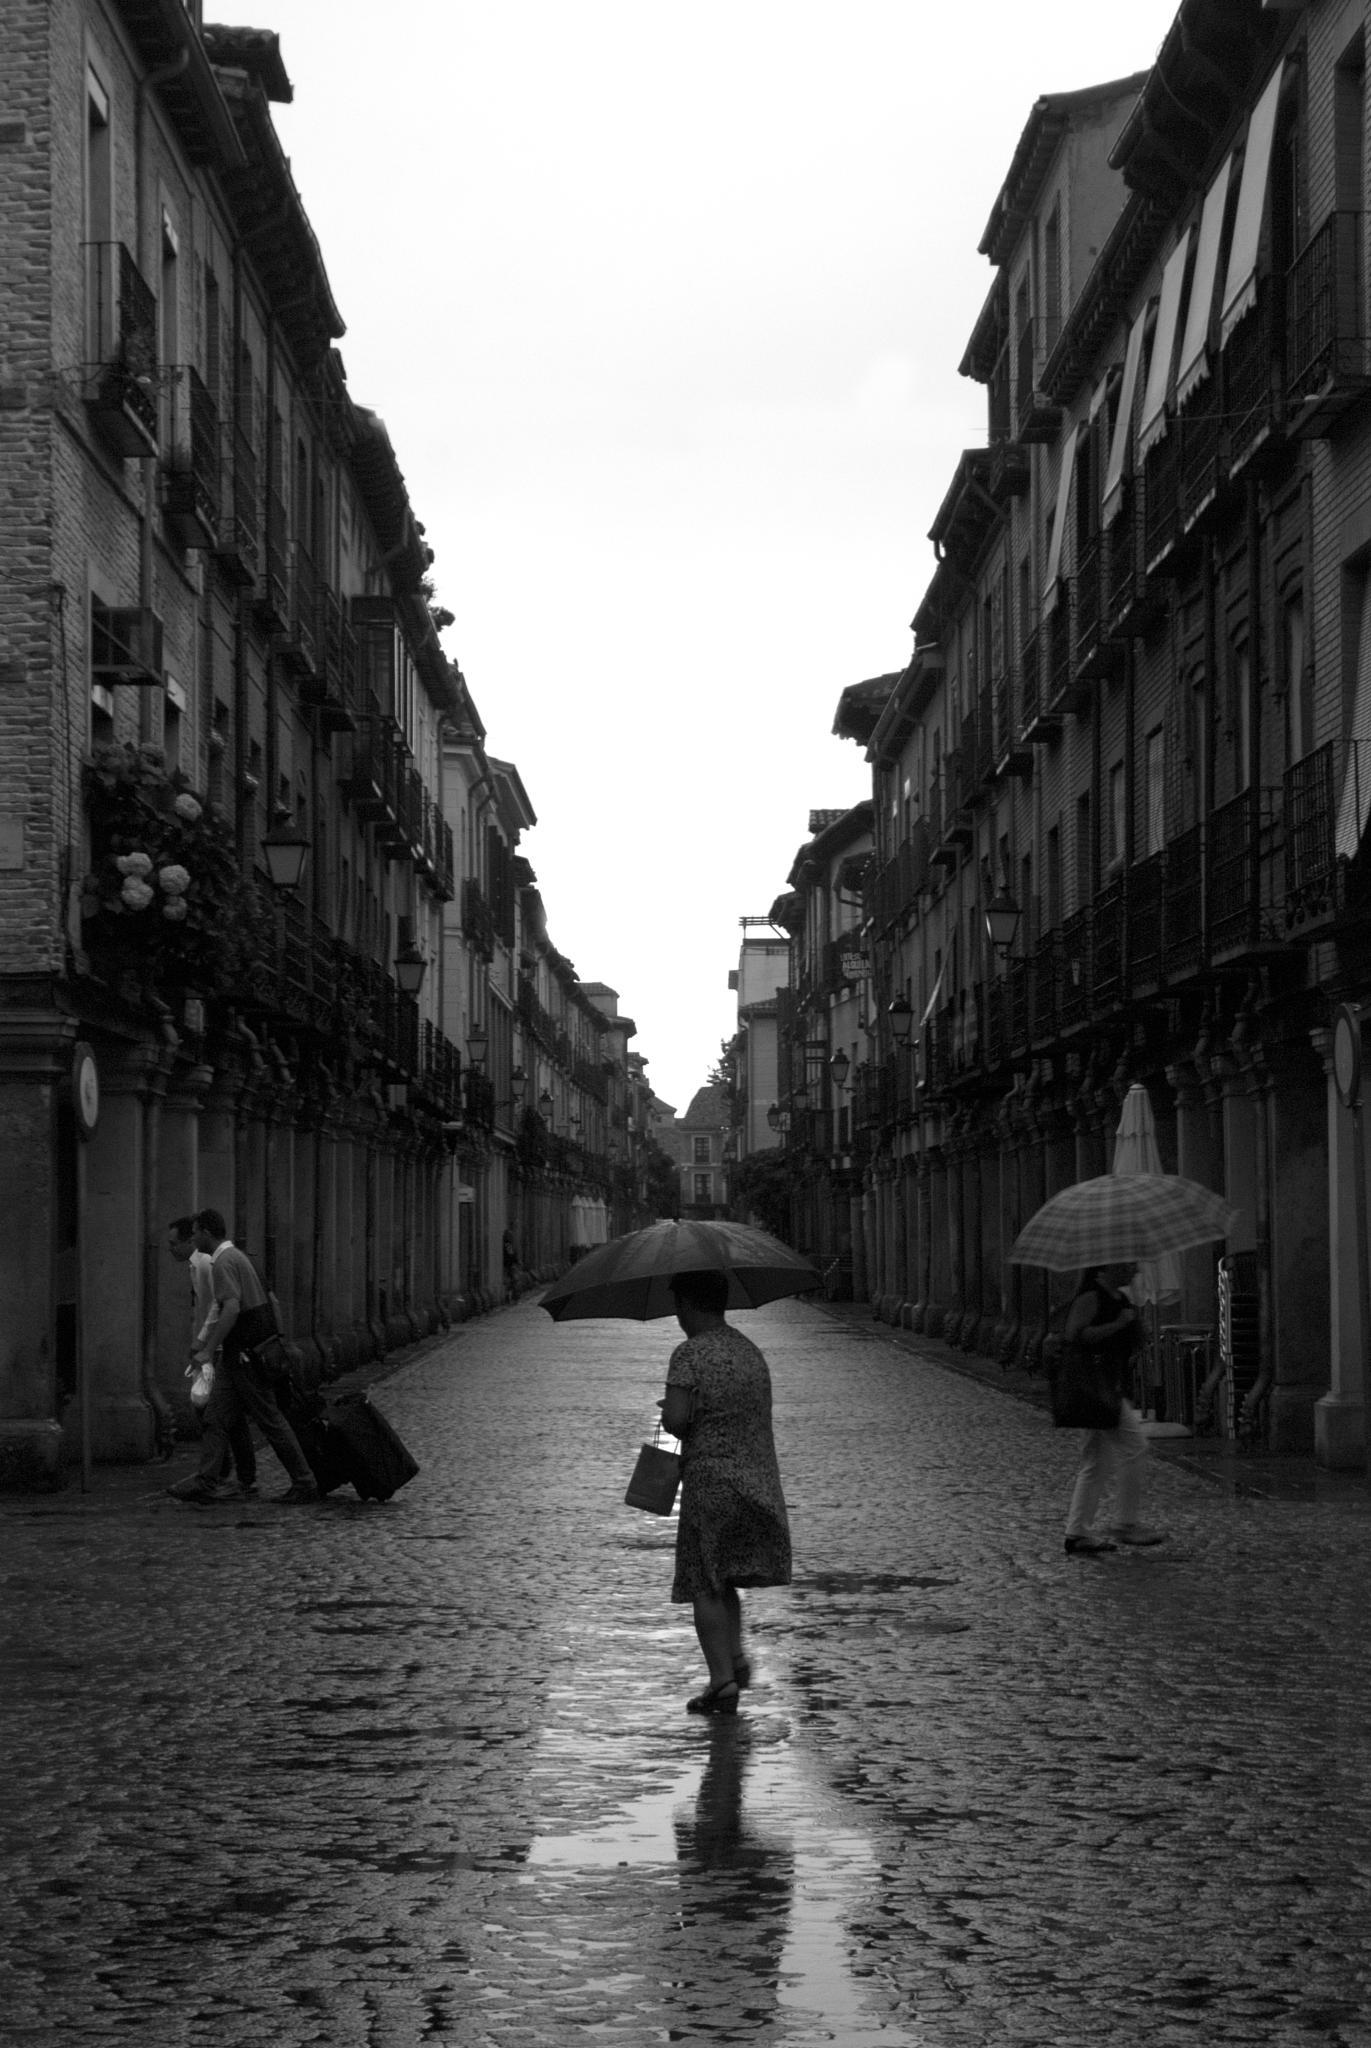 La calle mojada (2) by juliandelnogal